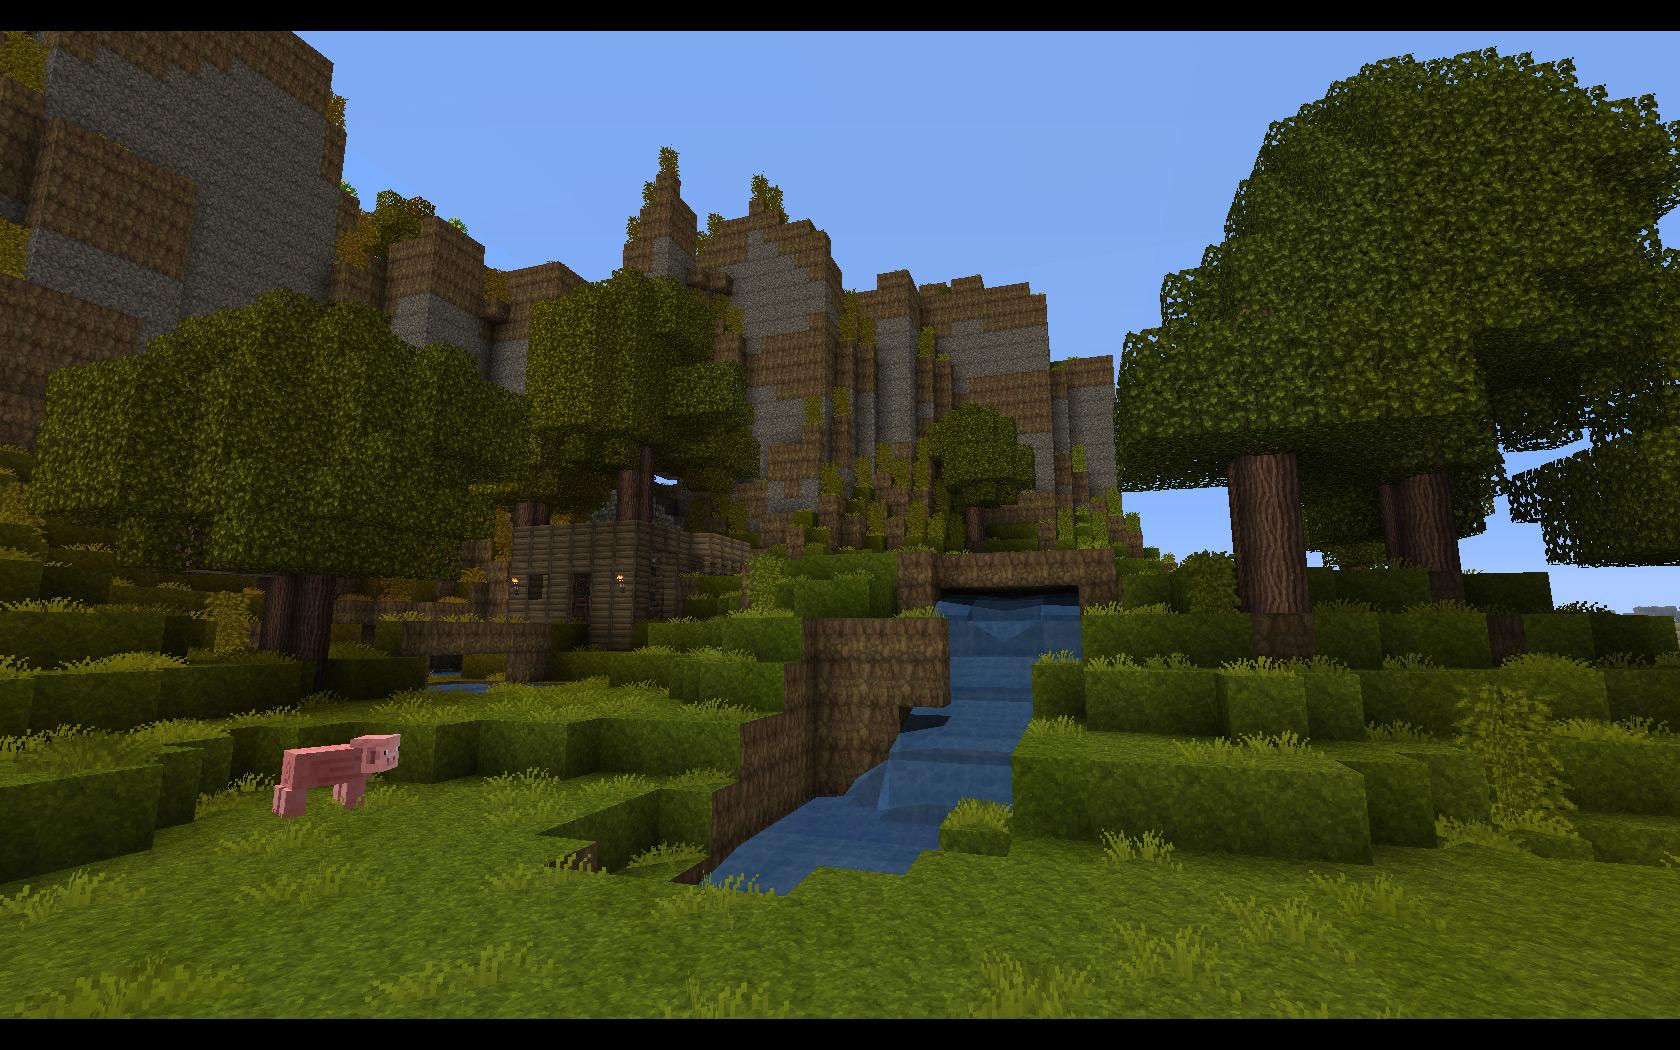 Simple Wallpaper Minecraft Houses - minecraft-wallpaper-1680x1050-11  HD_6438.jpg